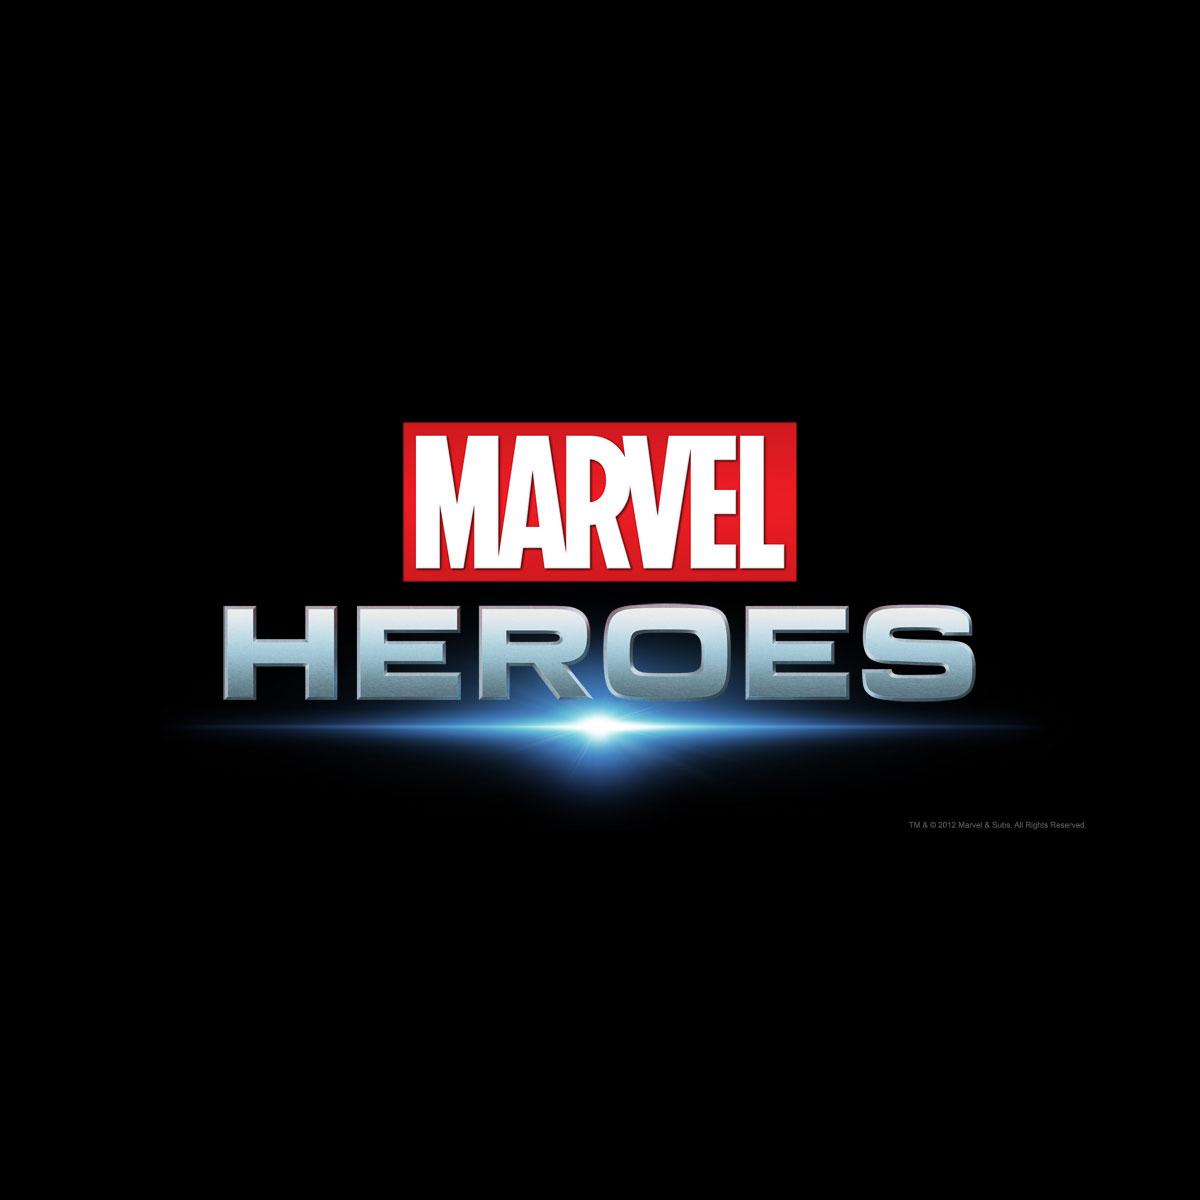 marvel heroes logo josh book animation director art